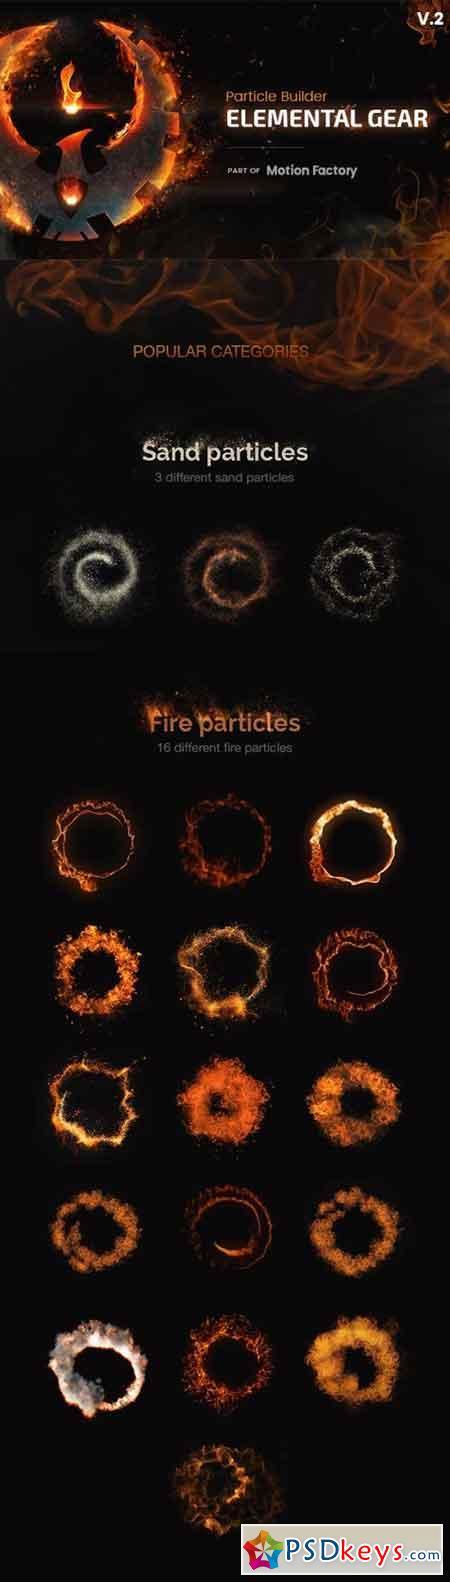 Particle Builder Elemental Gear Fire Sand Smoke Particular